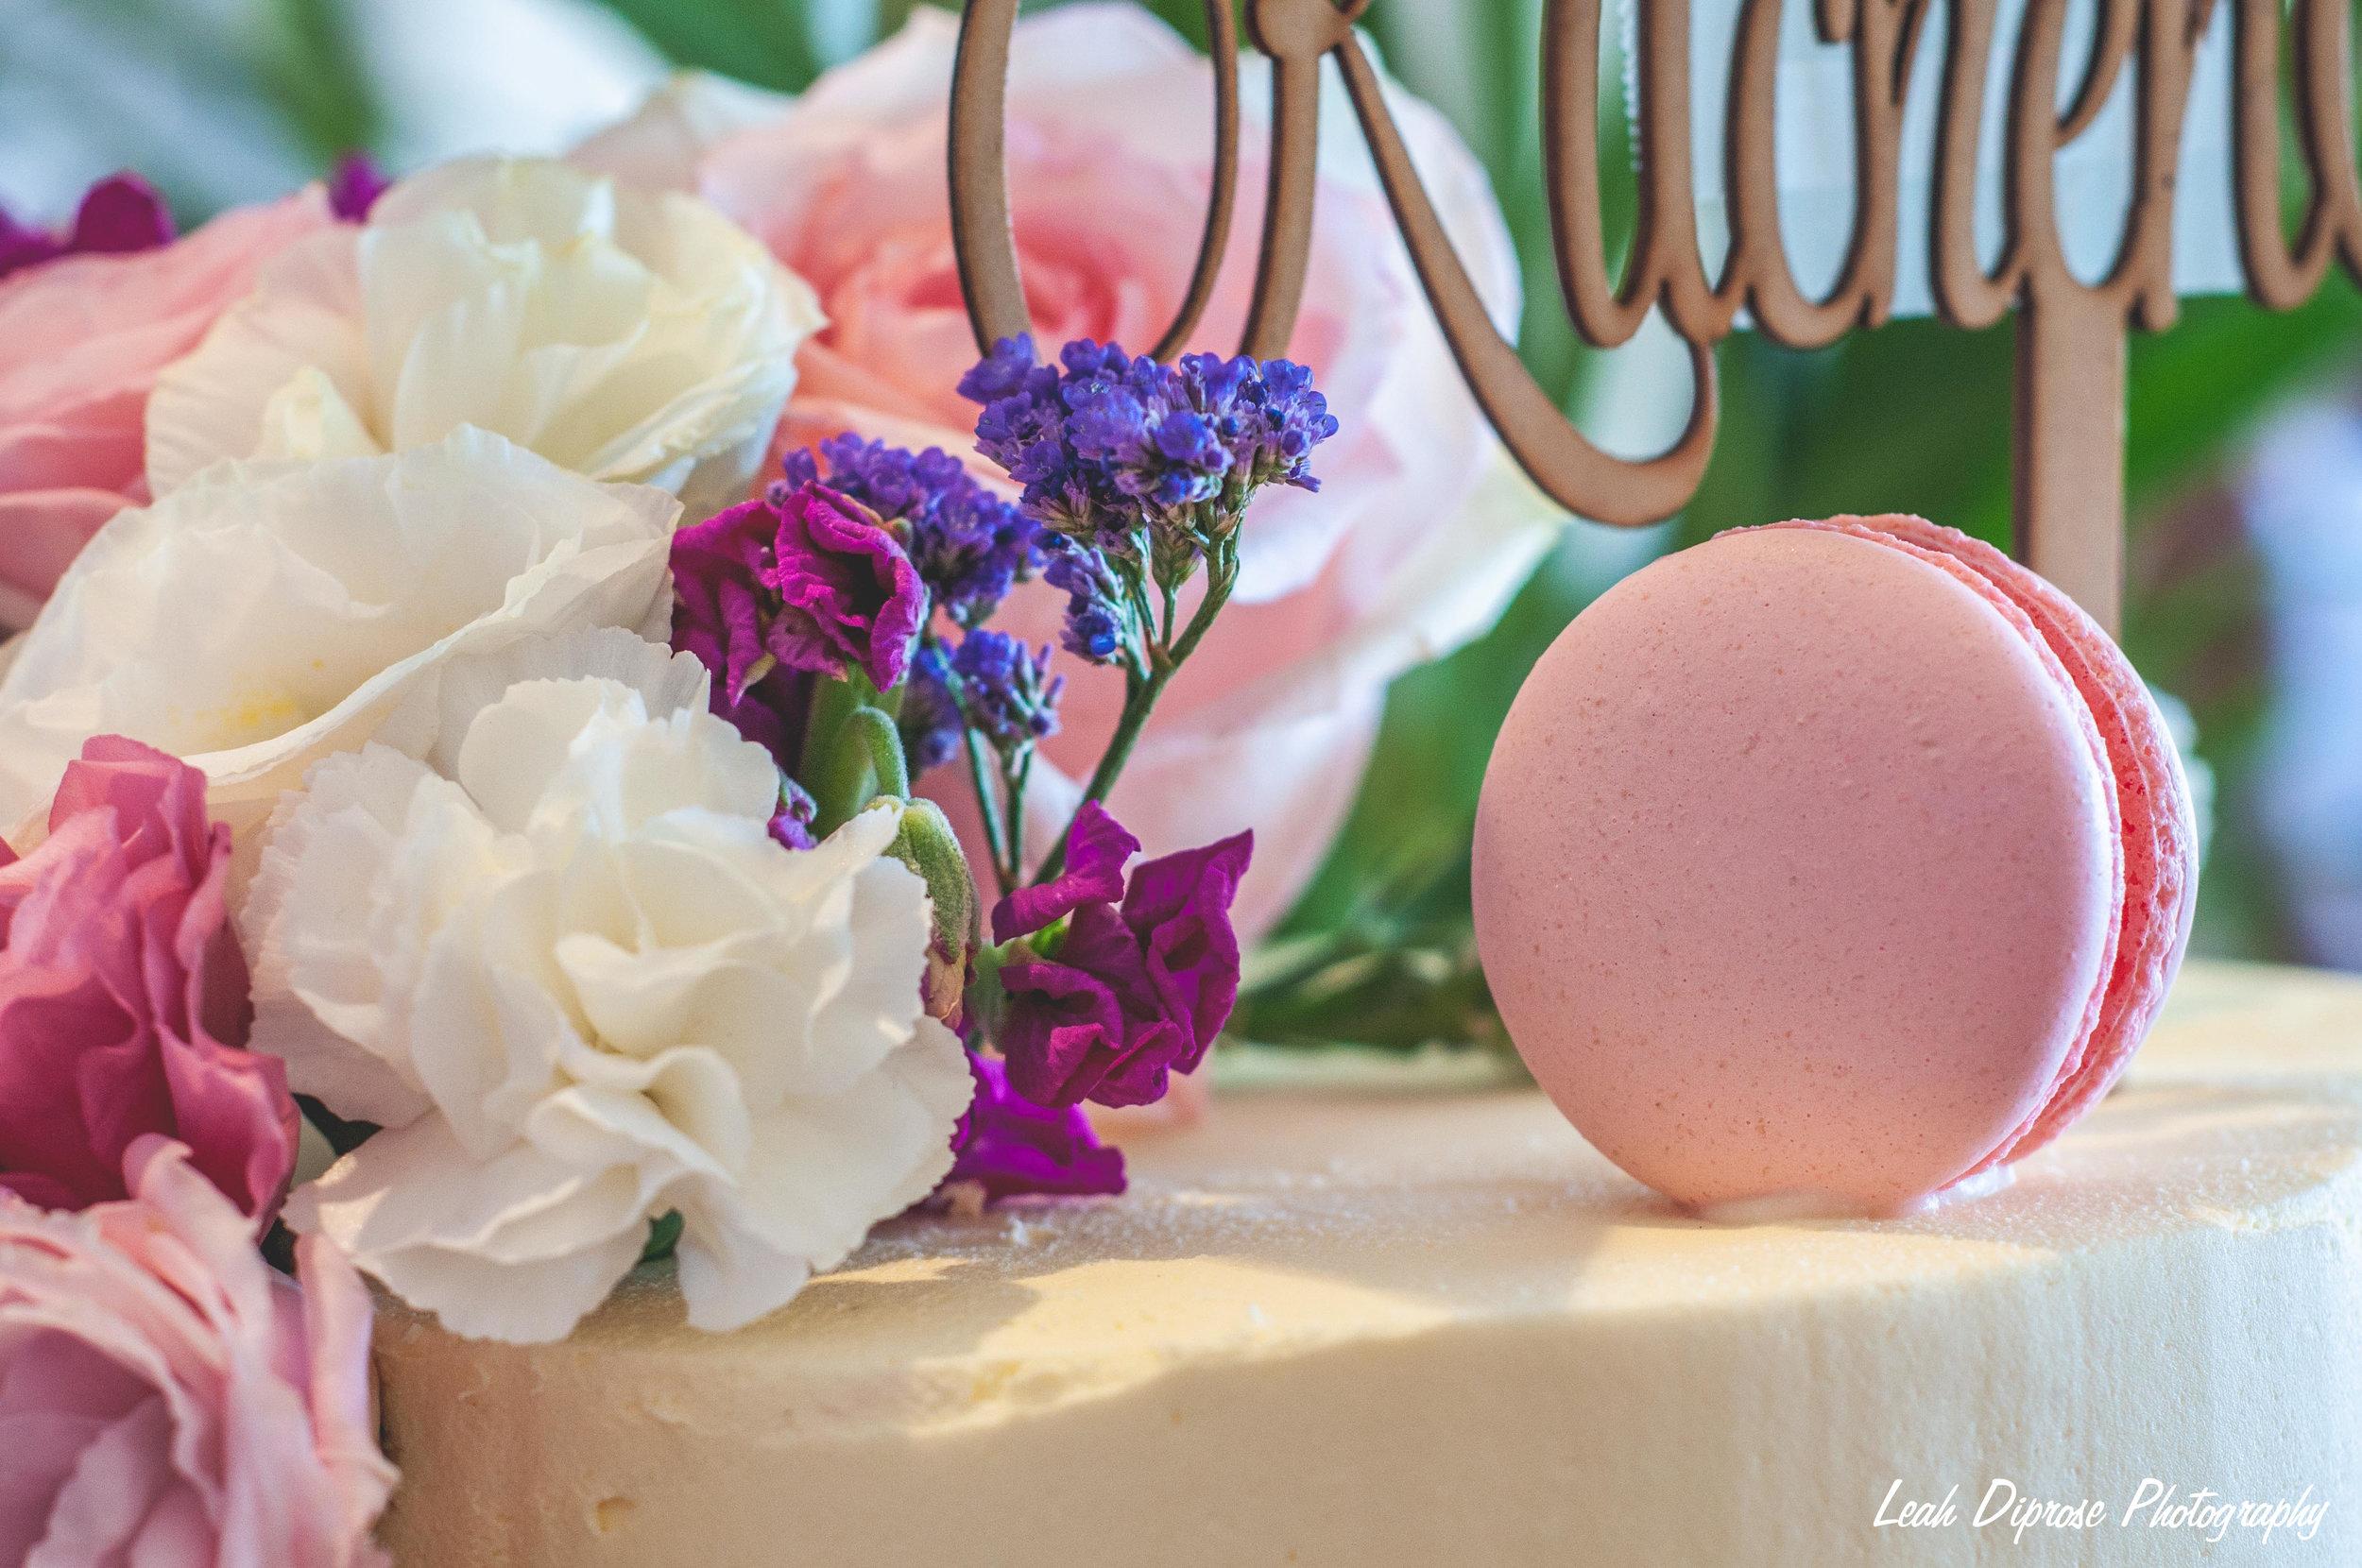 Leah Diprose Photography image-5796.jpg